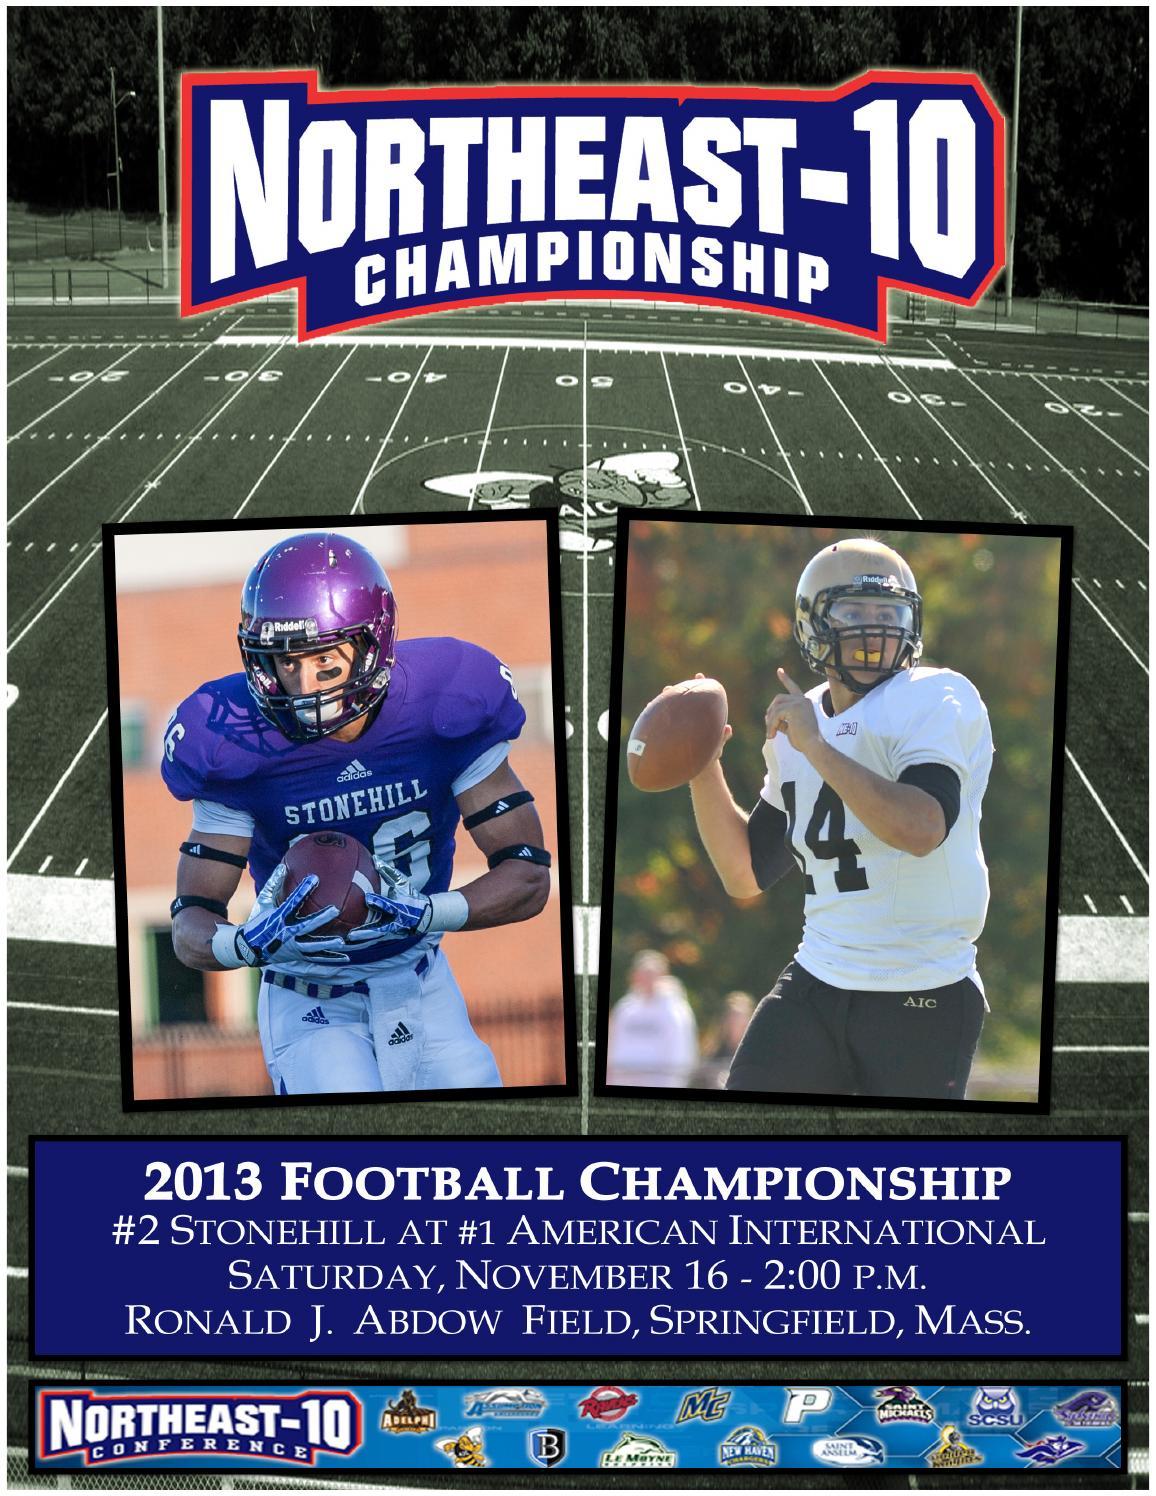 2013 Northeast-10 Football Championship by NE10 - issuu